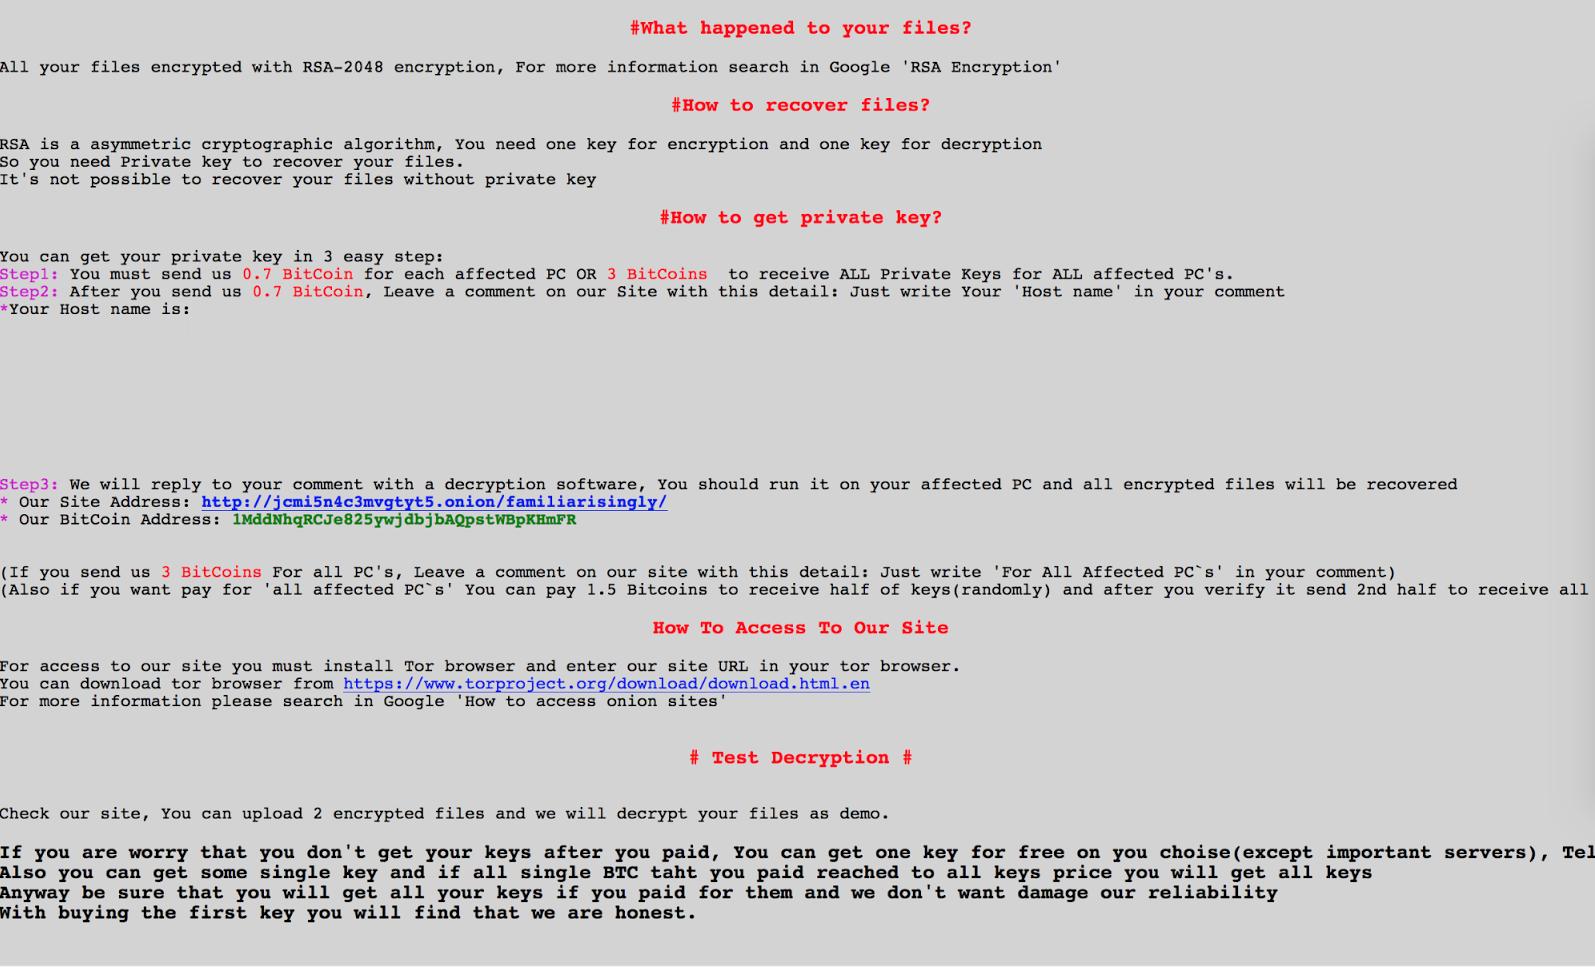 Virus weapologize Archivos (Sam Sam) - Cómo quitar - Restaurar archivos